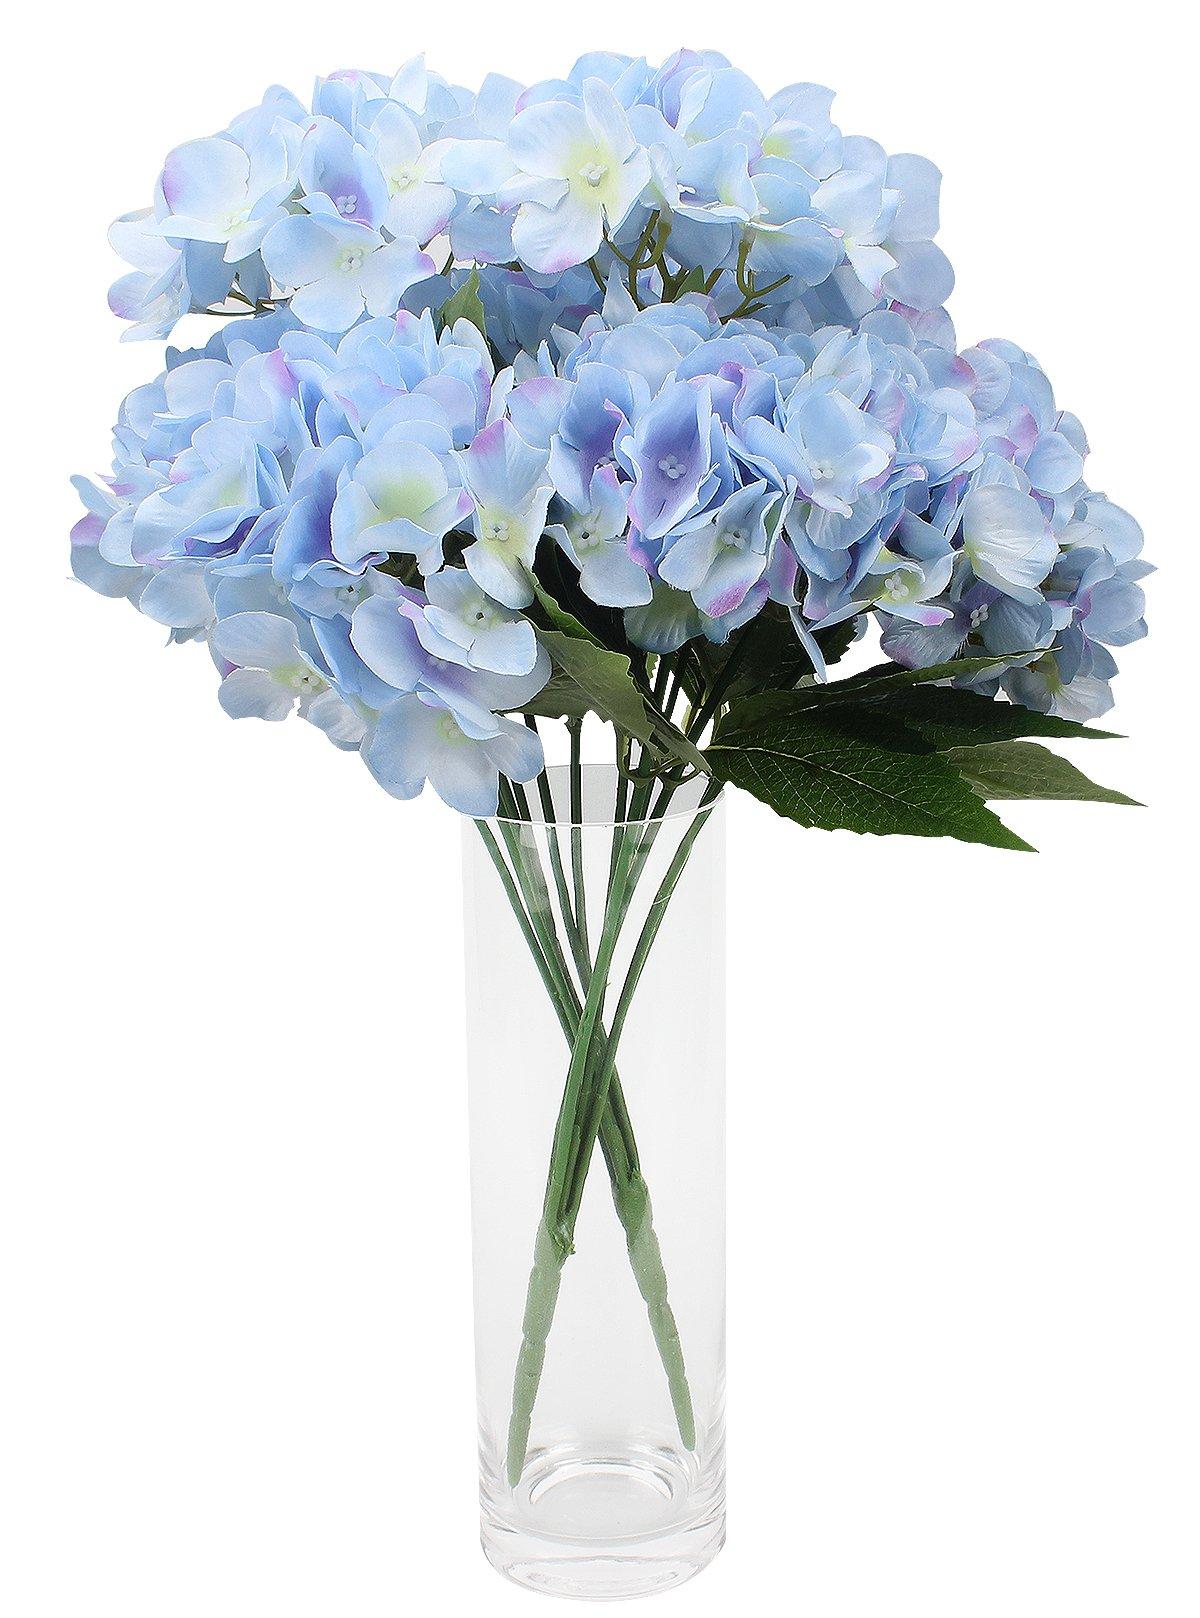 Duovlo-Artificial-Silk-Hydrangea-Flower-with-6-Heads-Flower-Bunch-Bouquet-Home-Wedding-Garden-Floral-Decor